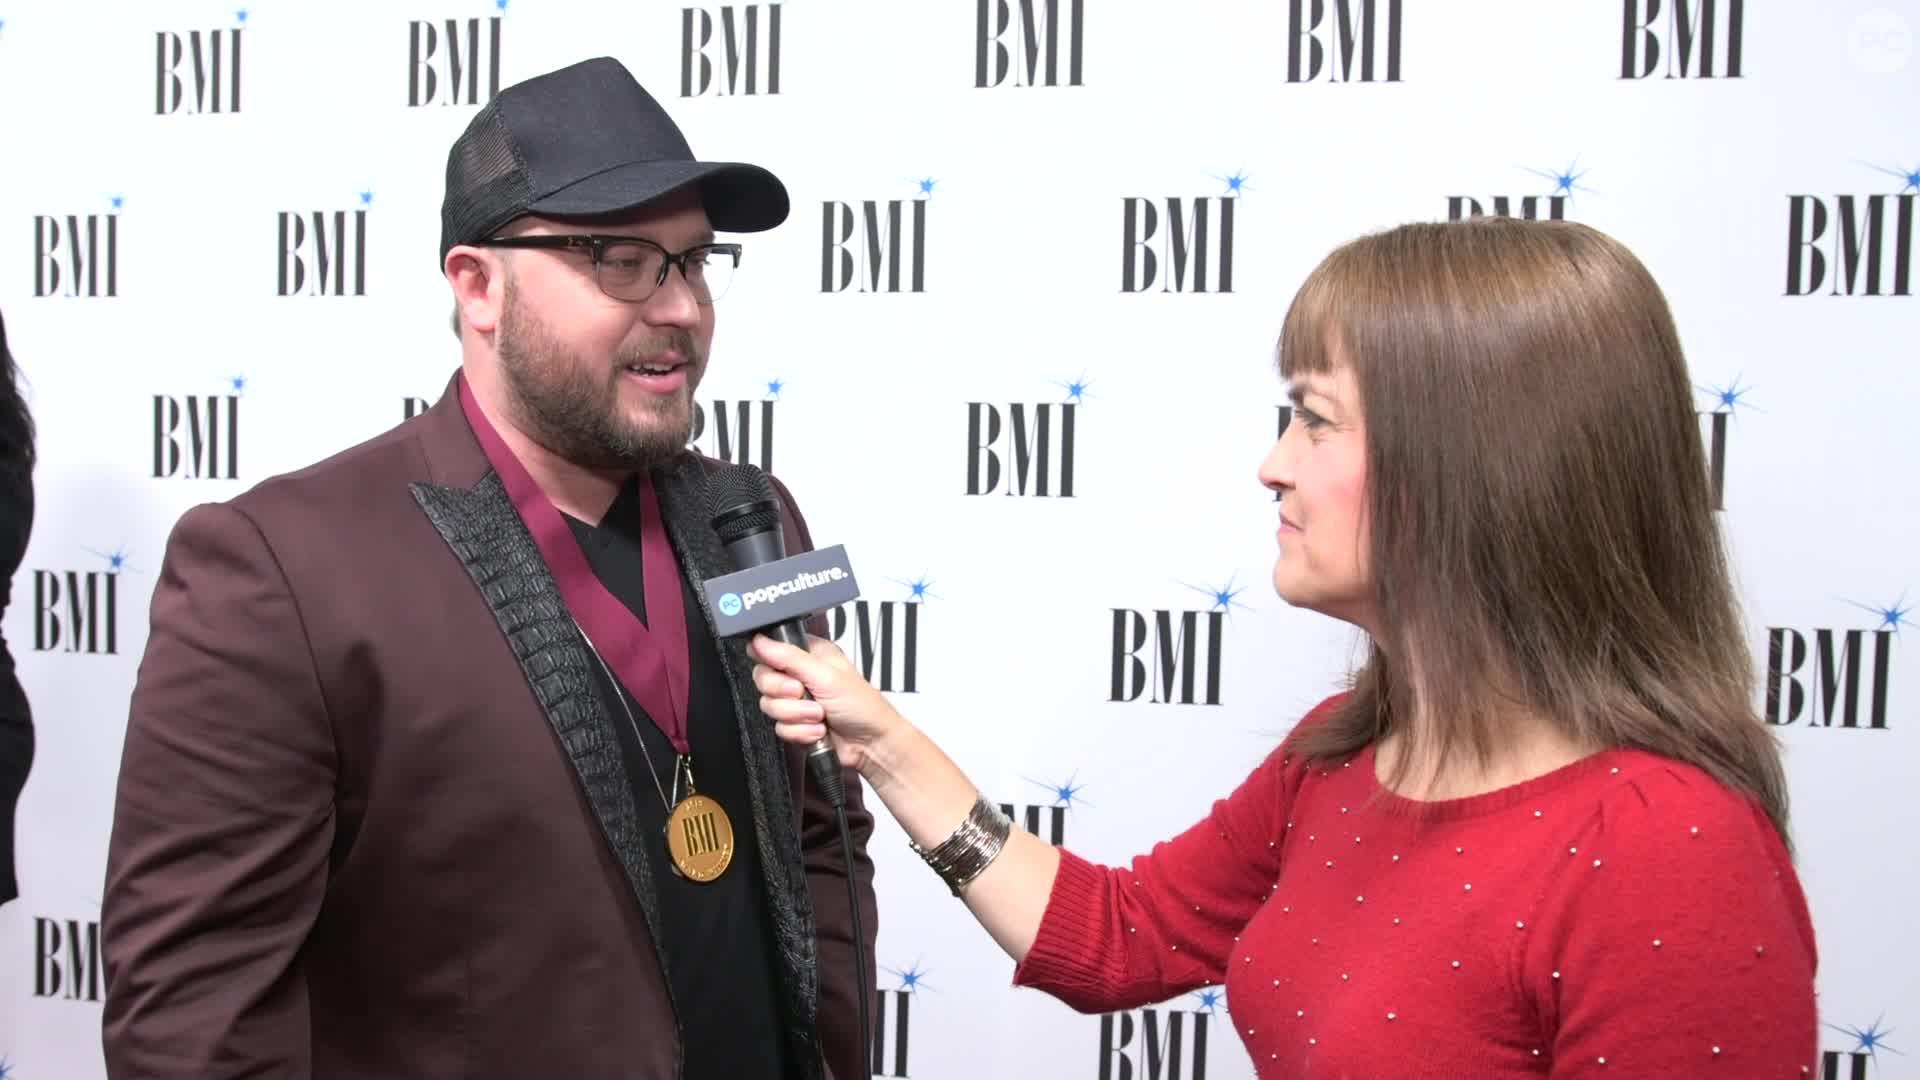 Mitchell Tenpenny - 2019 BMI Awards screen capture